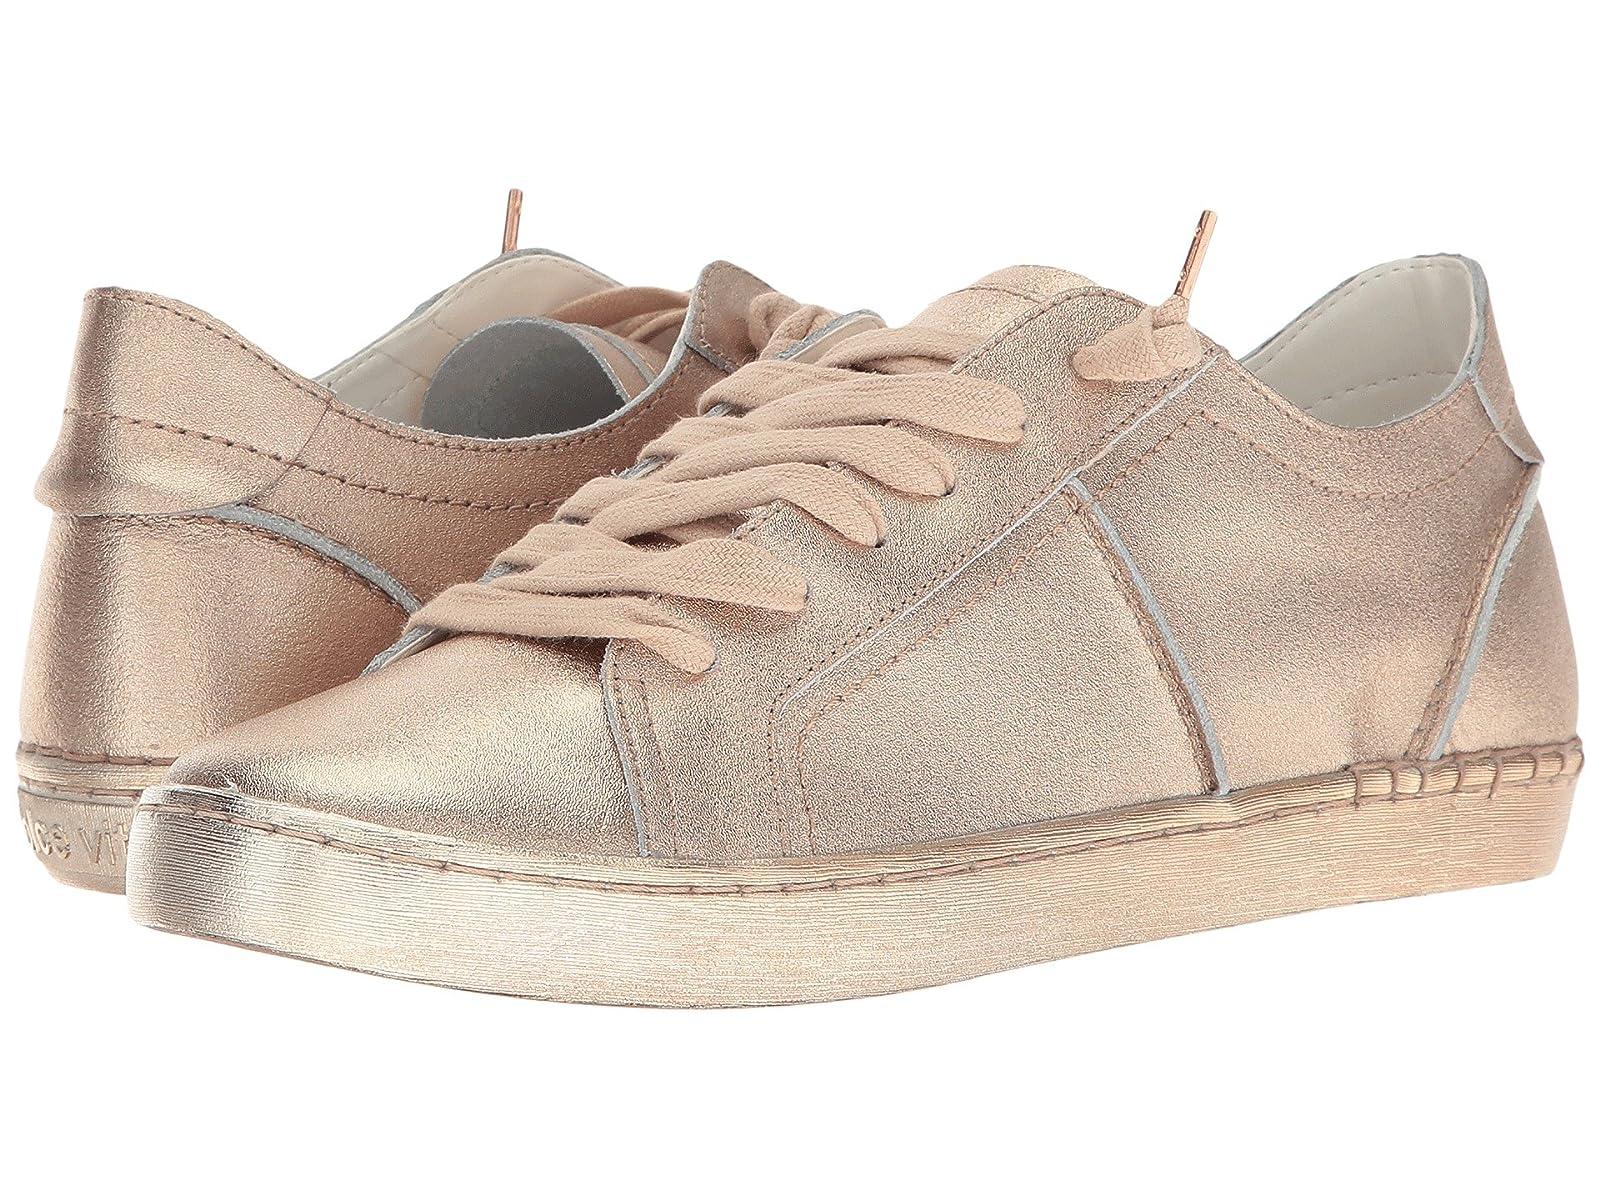 Dolce Vita ZalenCheap and distinctive eye-catching shoes